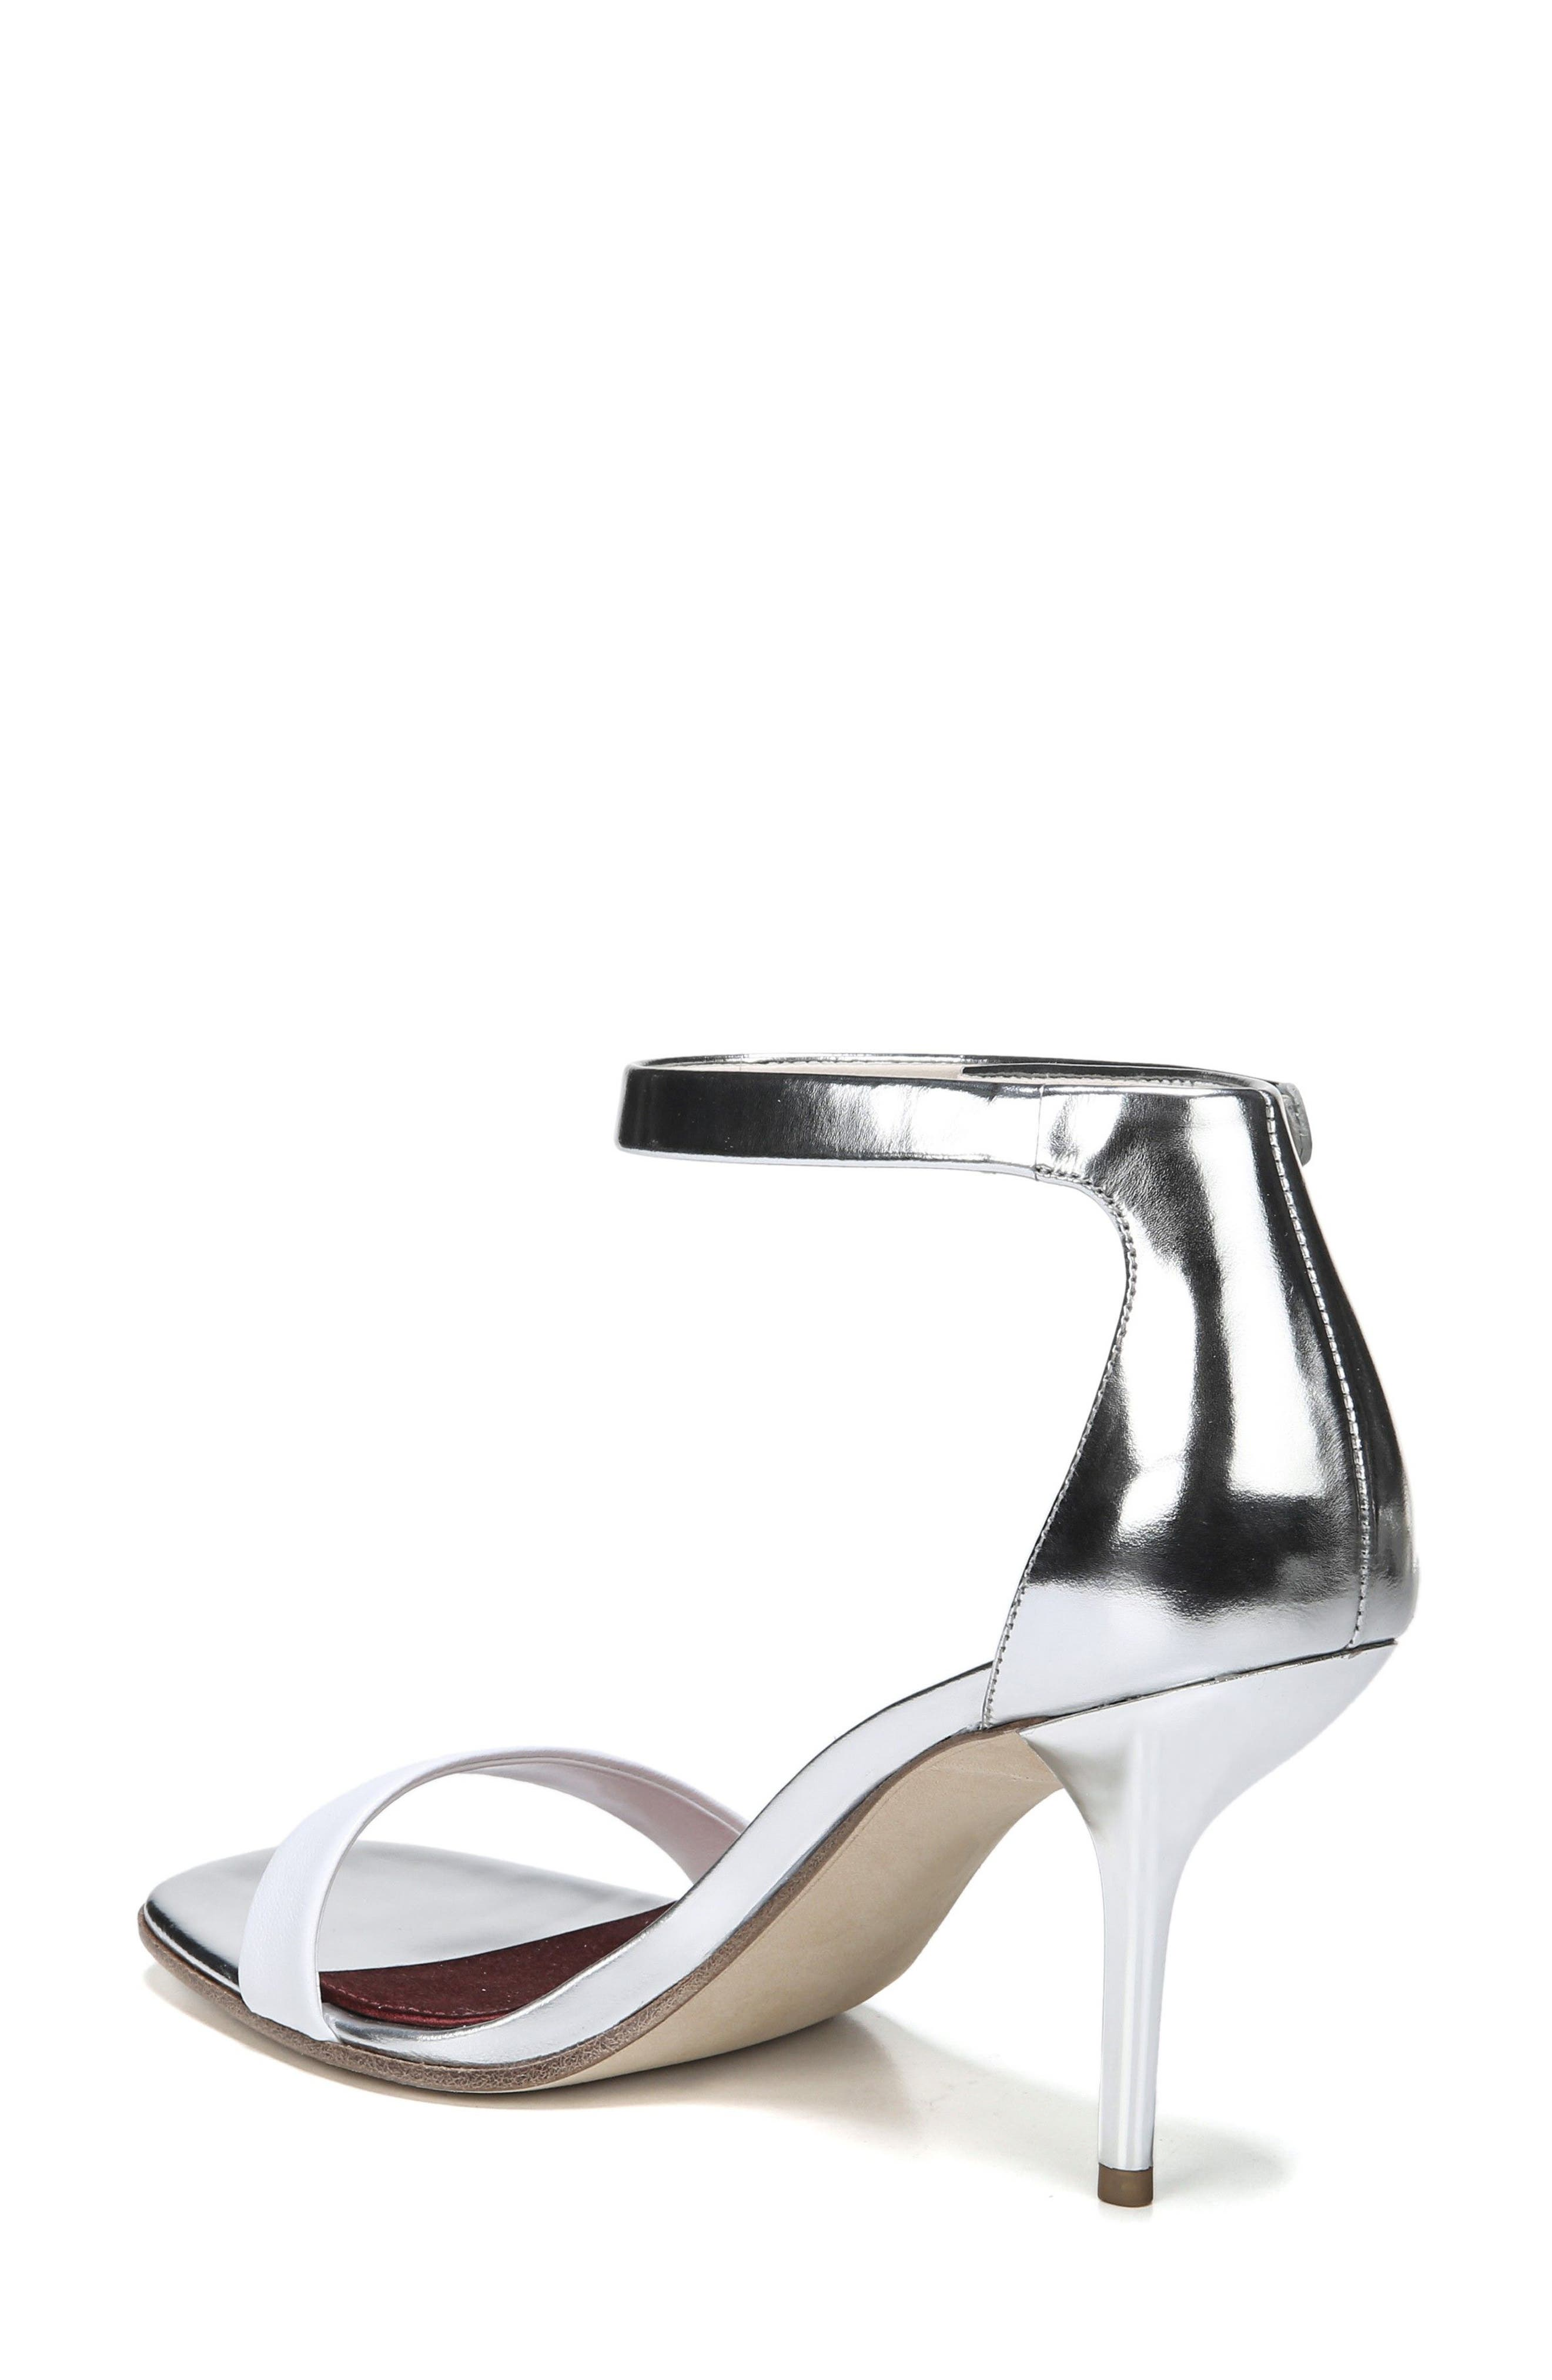 Ferrara Ankle Strap Sandal,                             Alternate thumbnail 6, color,